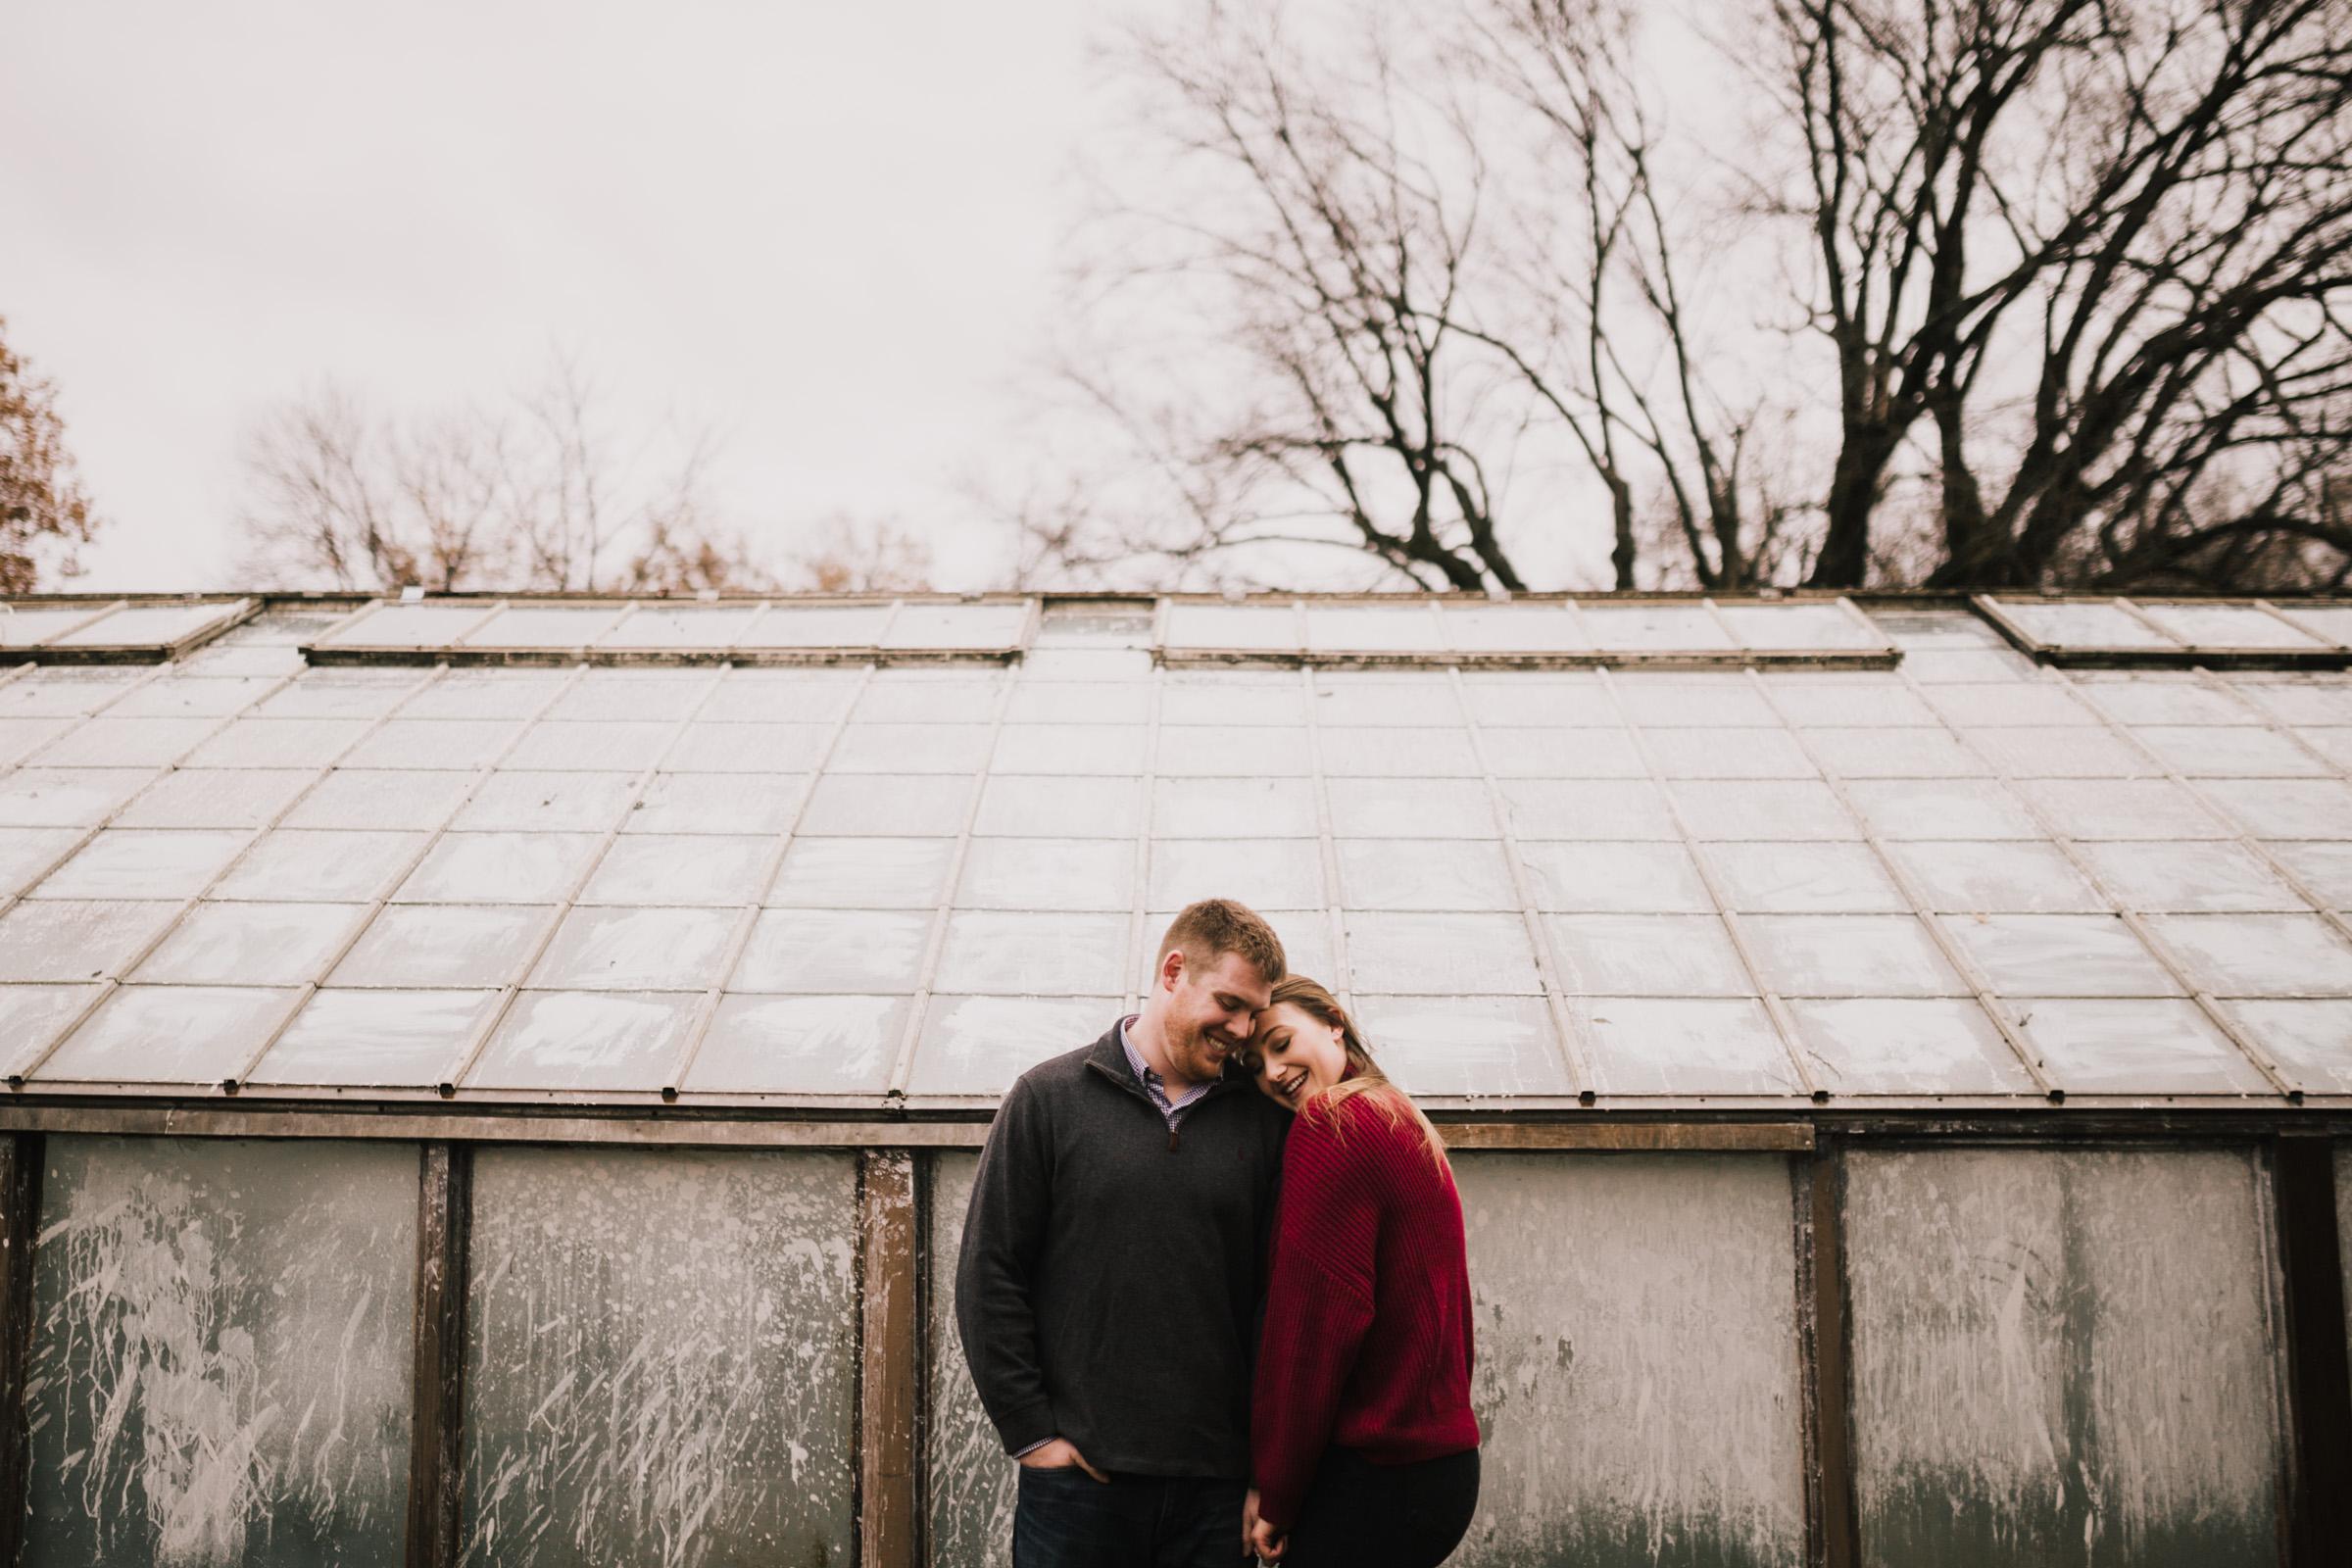 alyssa barletter photography johns greenhouse kansas city missouri brookside waldo engagement session winter-1.jpg